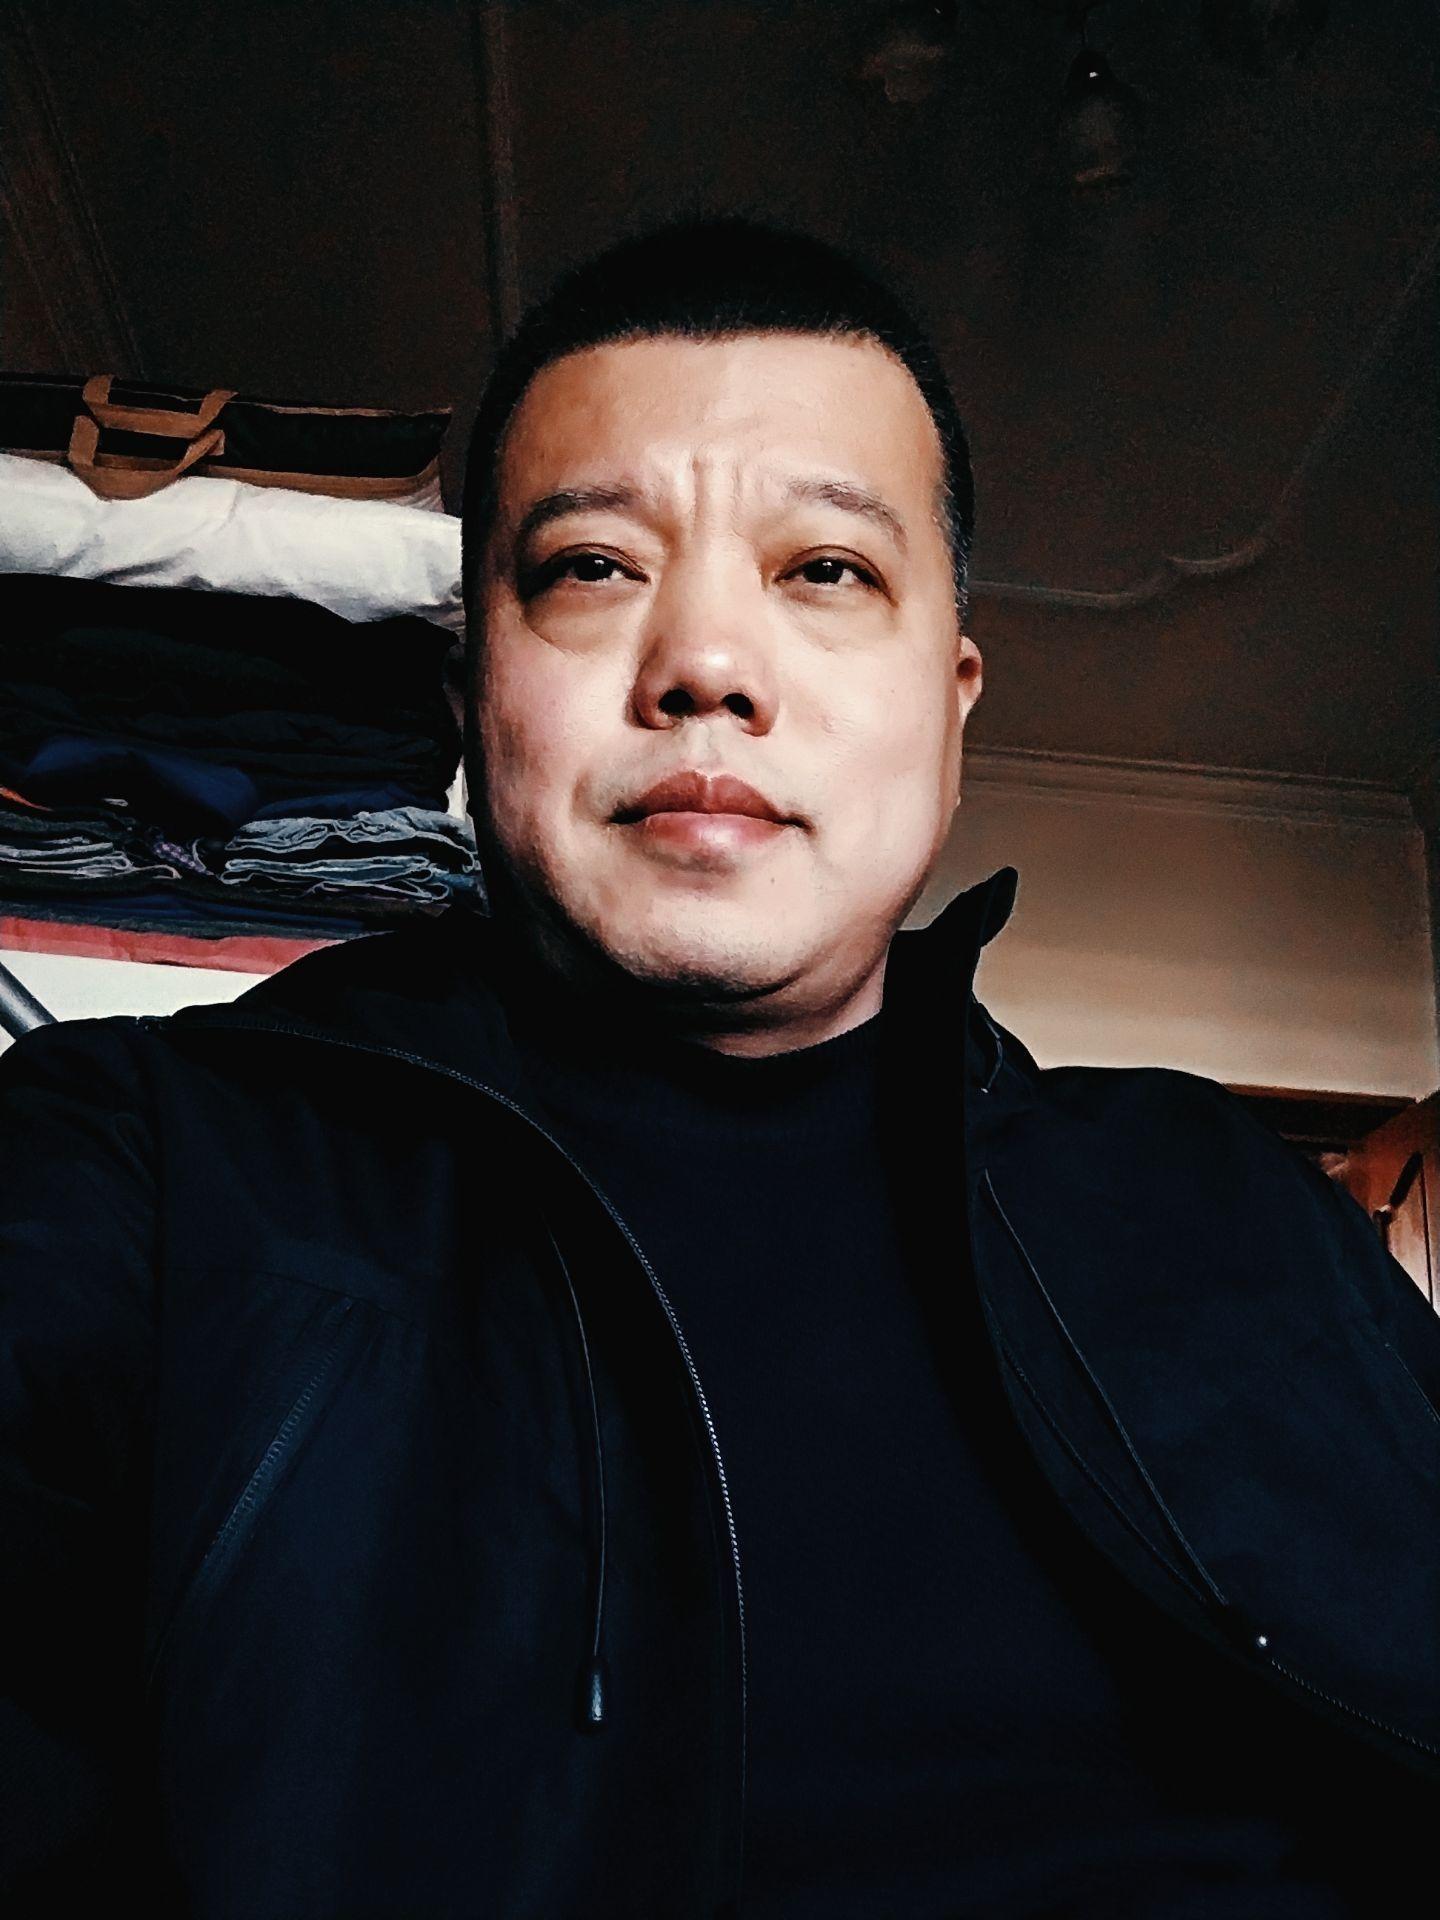 江湖风之子